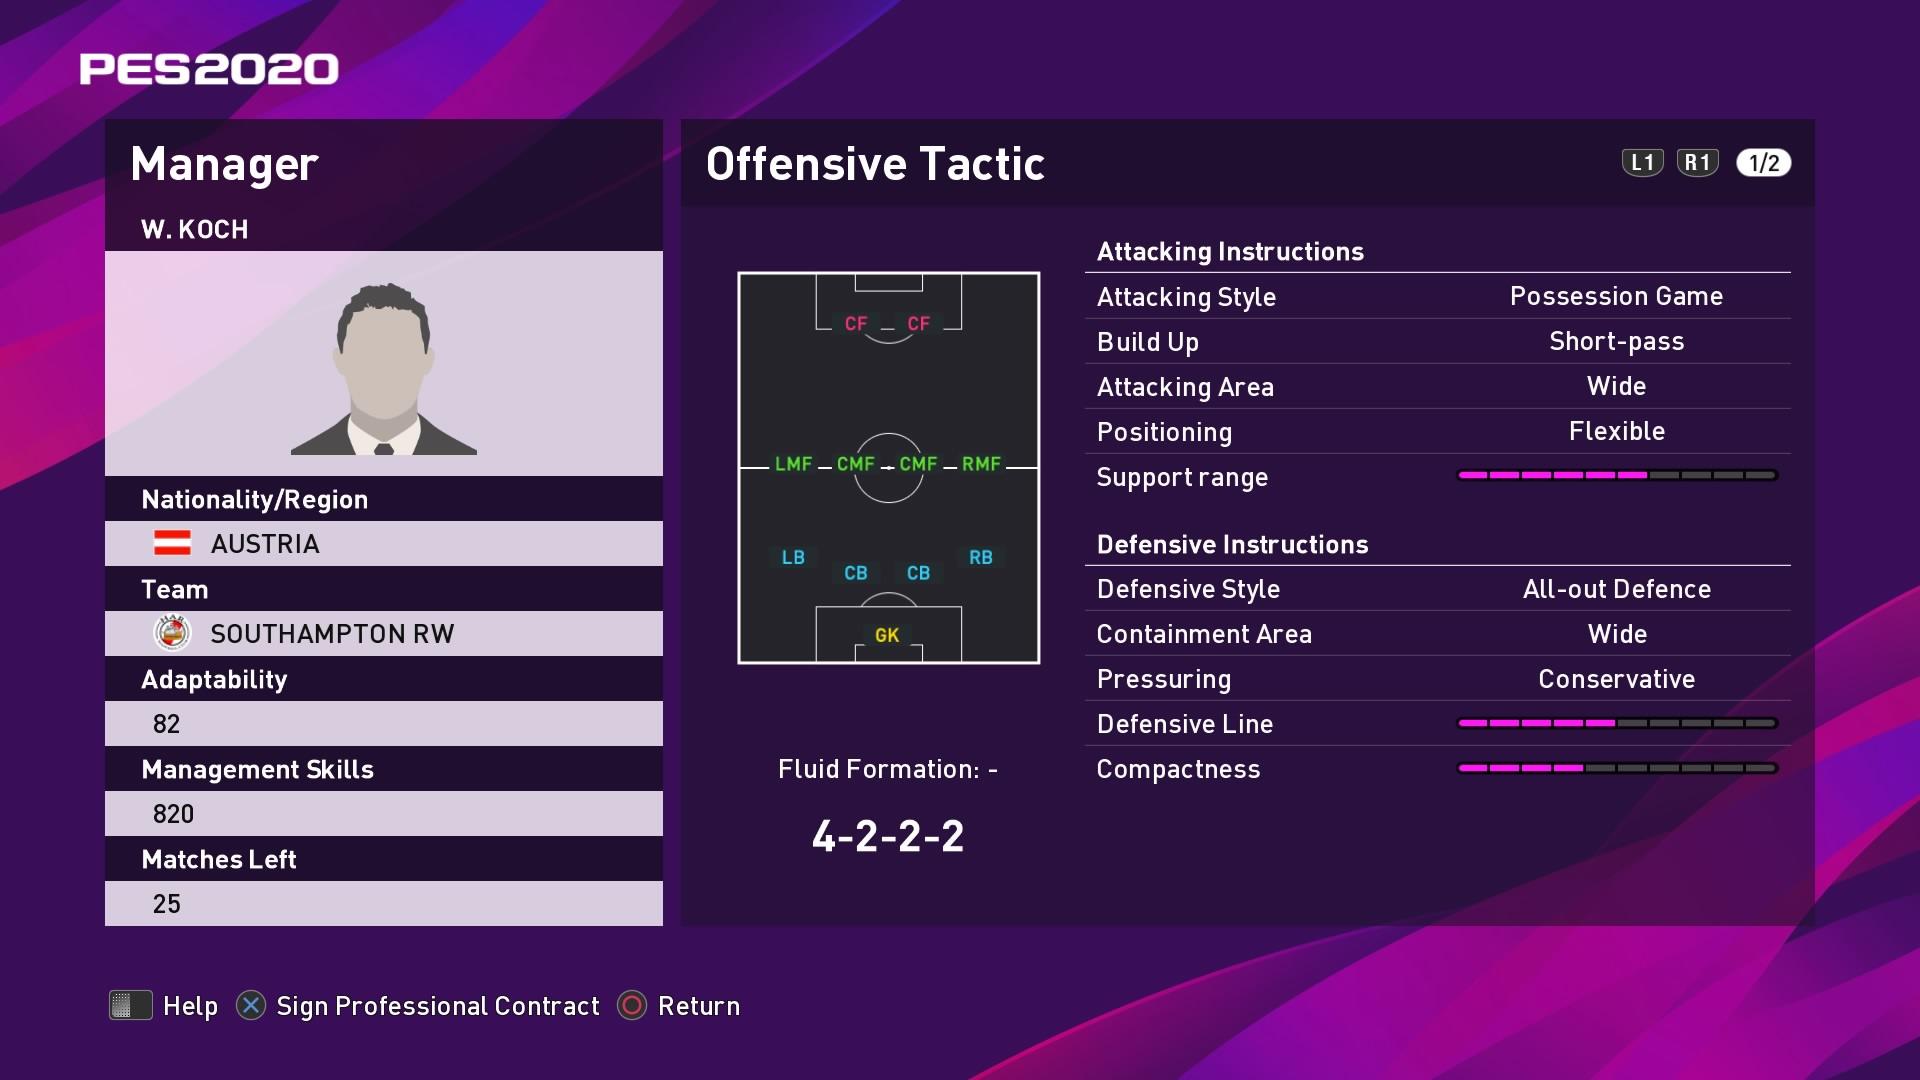 W. Koch (Ralph Hasenhüttl) Offensive Tactic in PES 2020 myClub